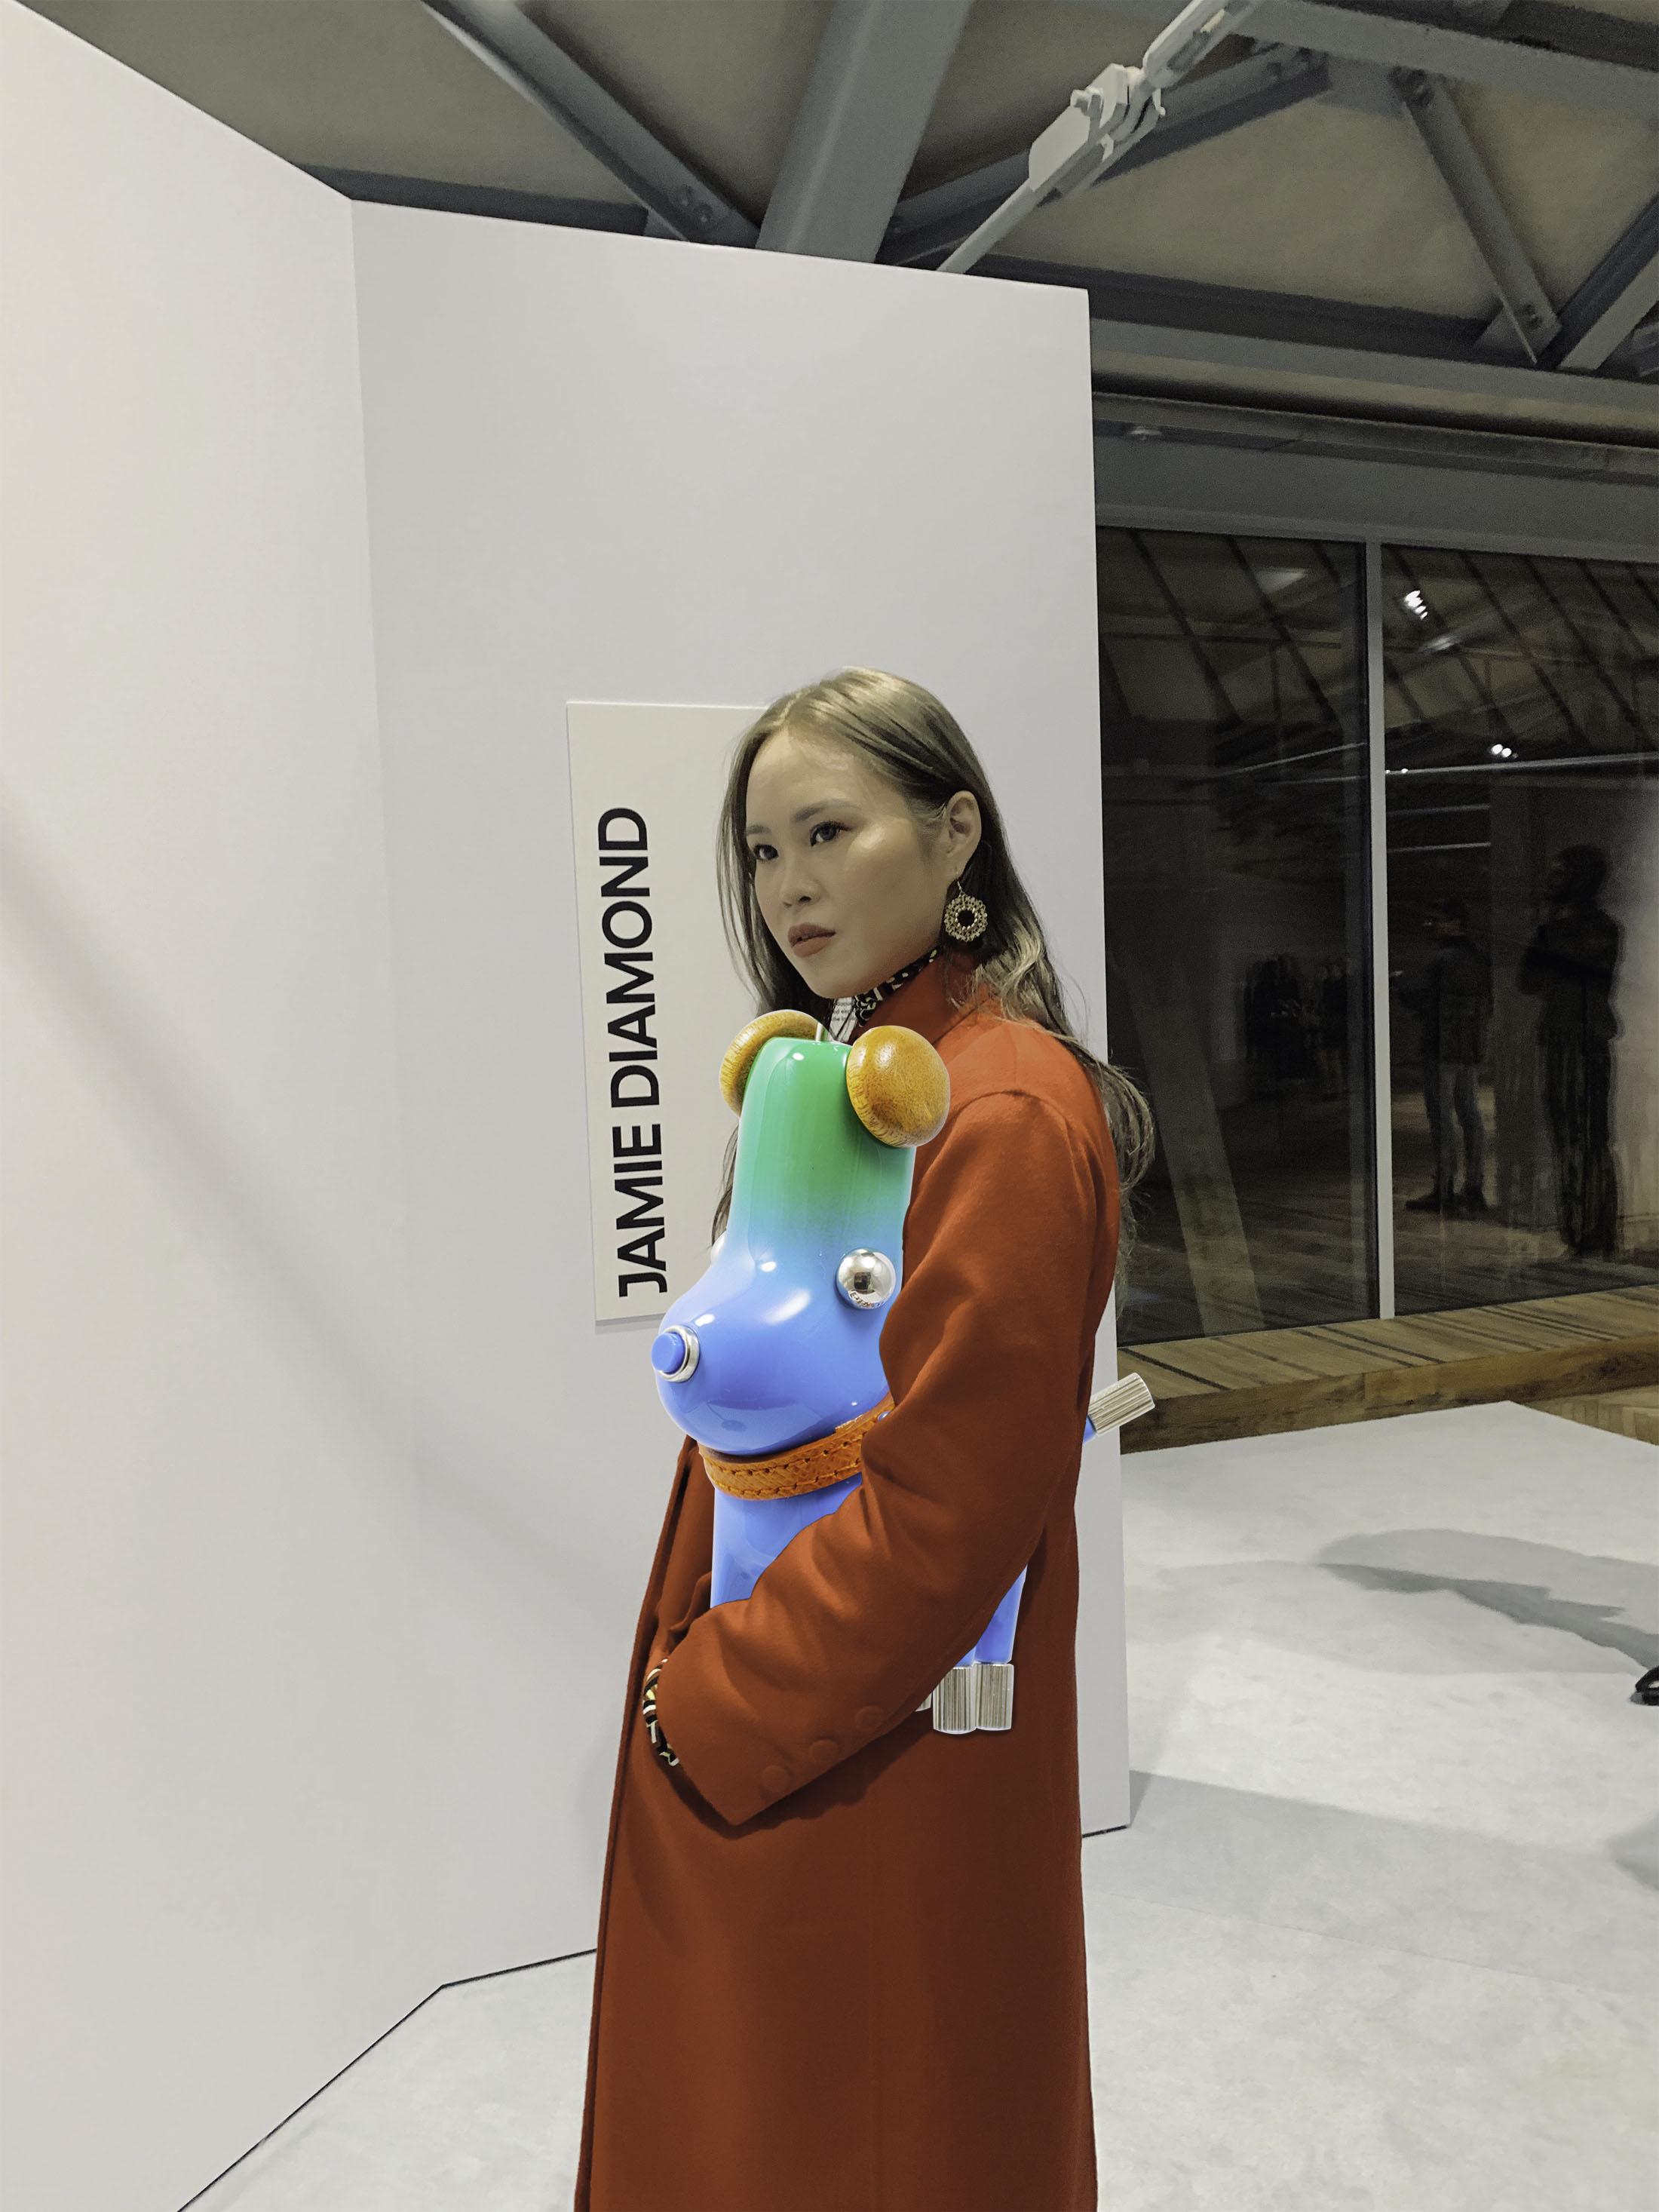 Surrogati. Un Amore Ideale At Prada Fondazione (4 - 29).jpg